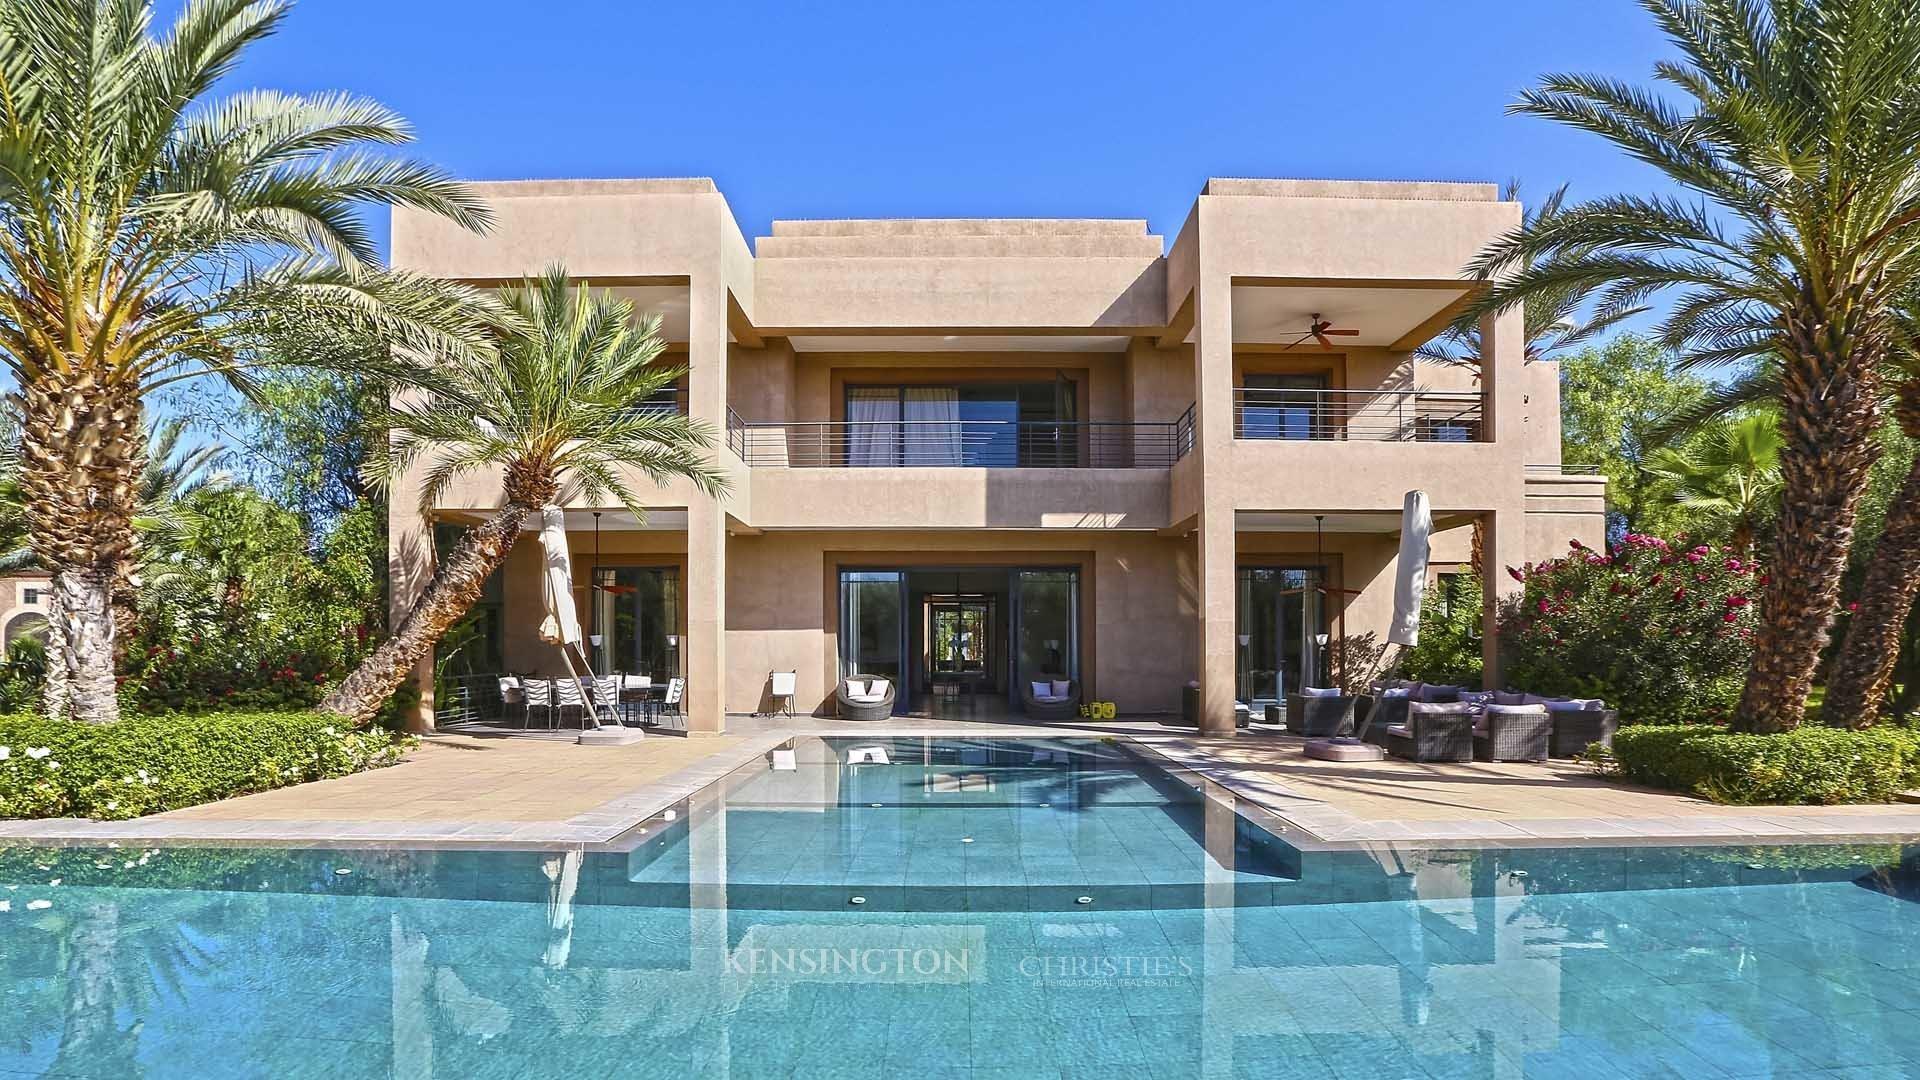 KPPM01327: Villa Georgia Luxury Villa Marrakech Morocco